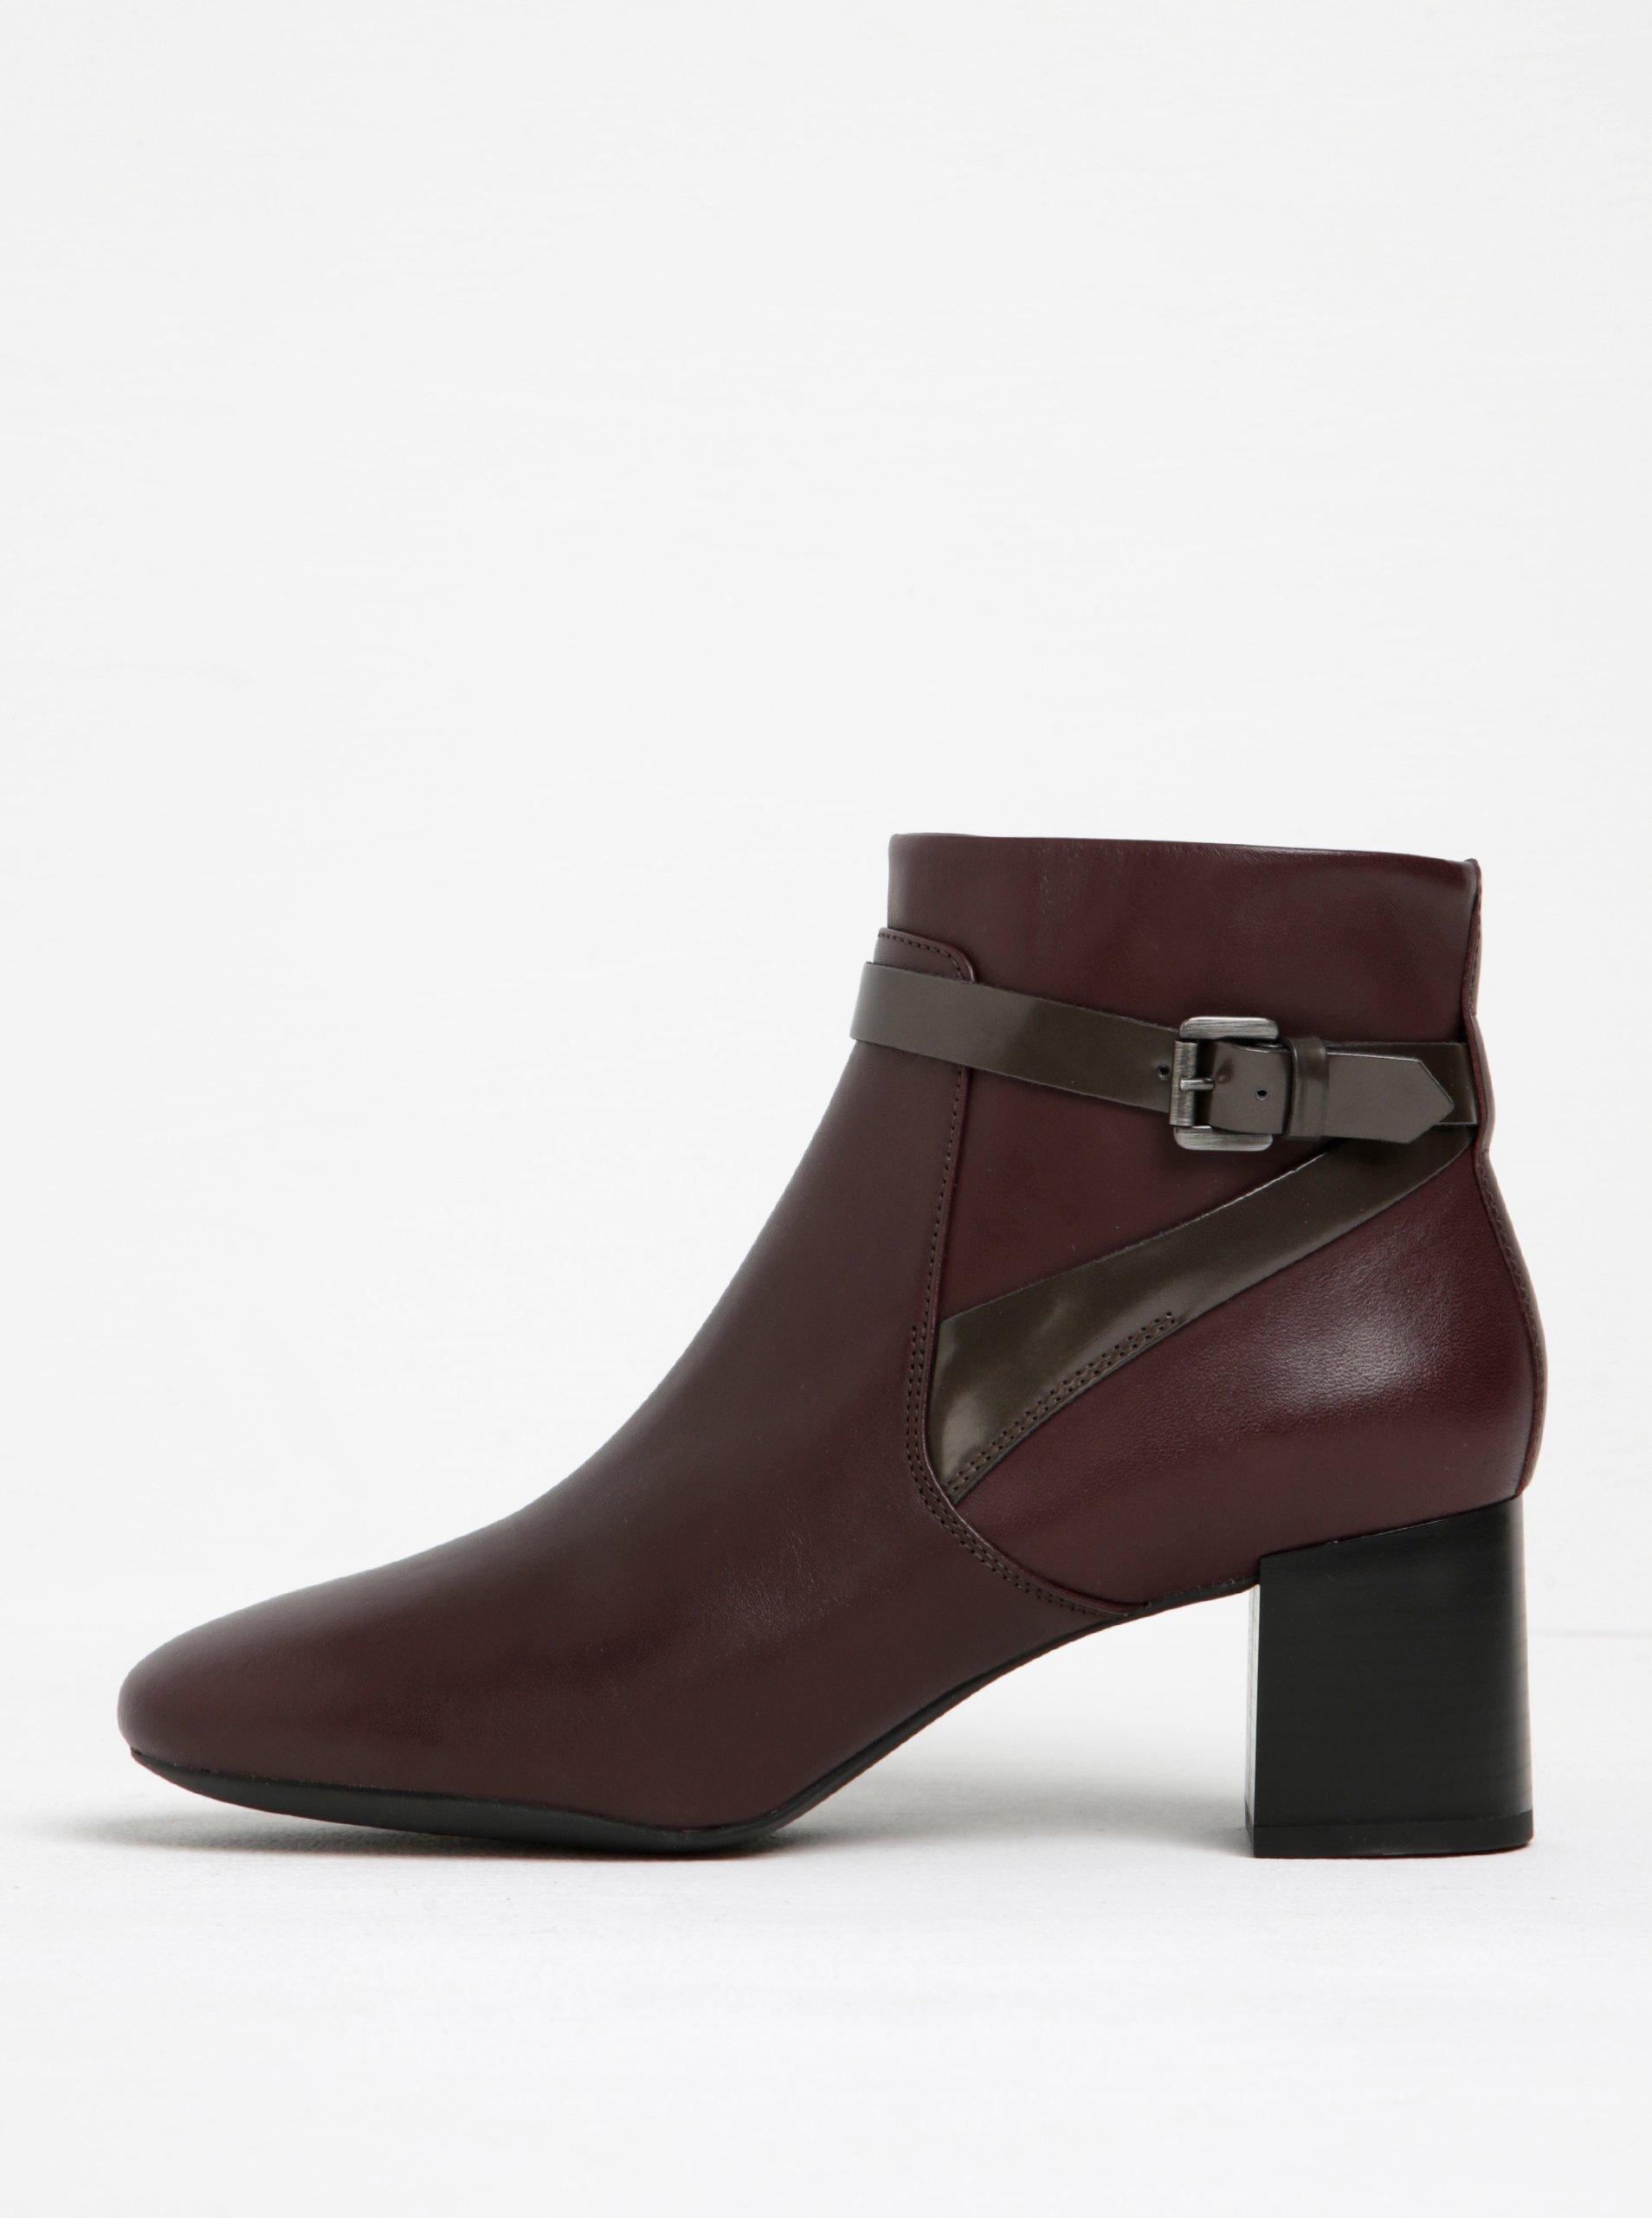 Vínové dámske kožené členkové topánky na podpätku Geox Audalies